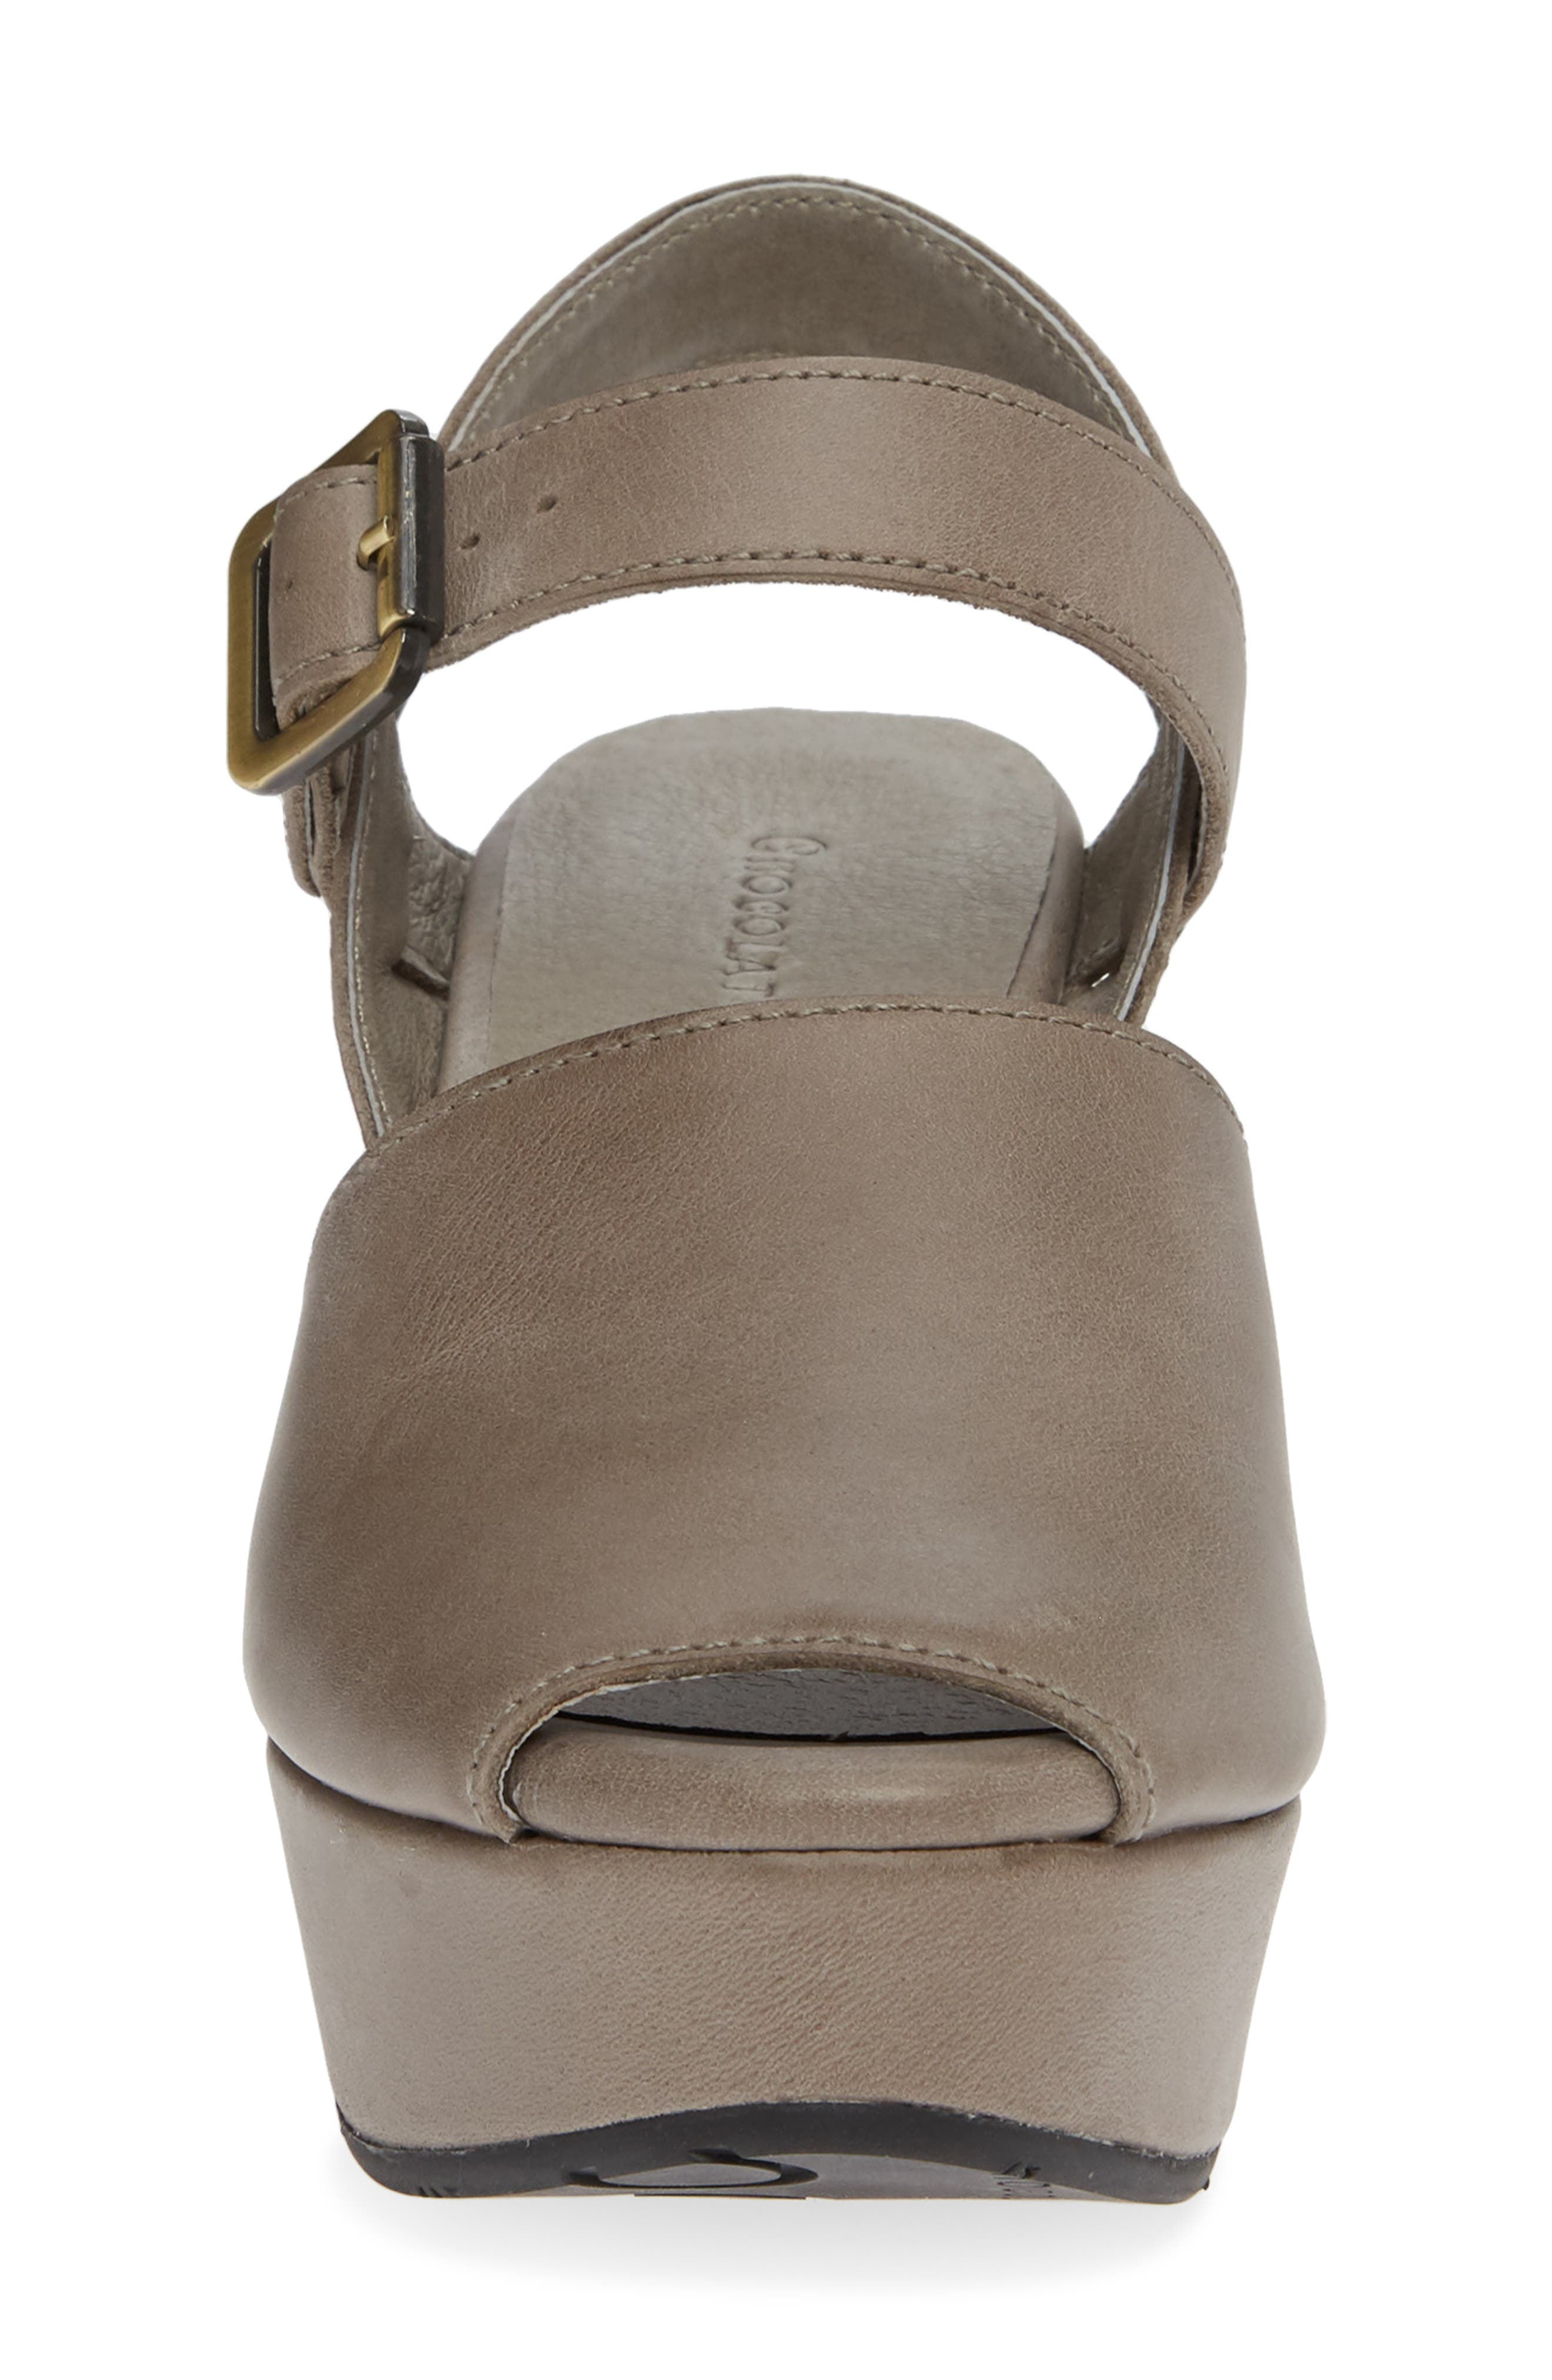 Wagga Platform Wedge Sandal,                             Alternate thumbnail 4, color,                             GREY LEATHER